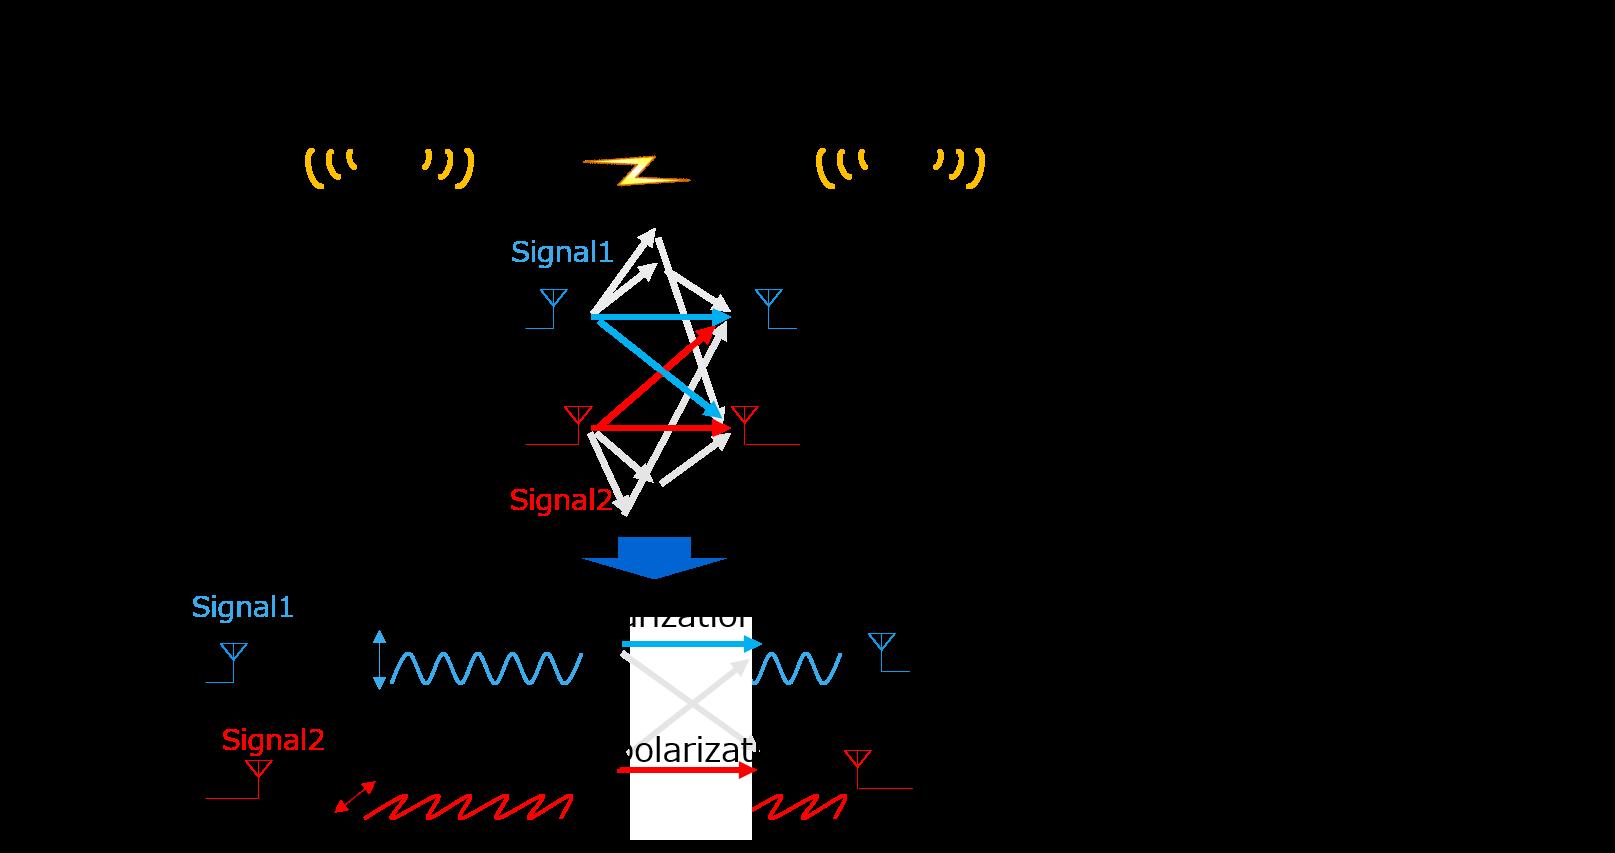 Use of polarized MIMO